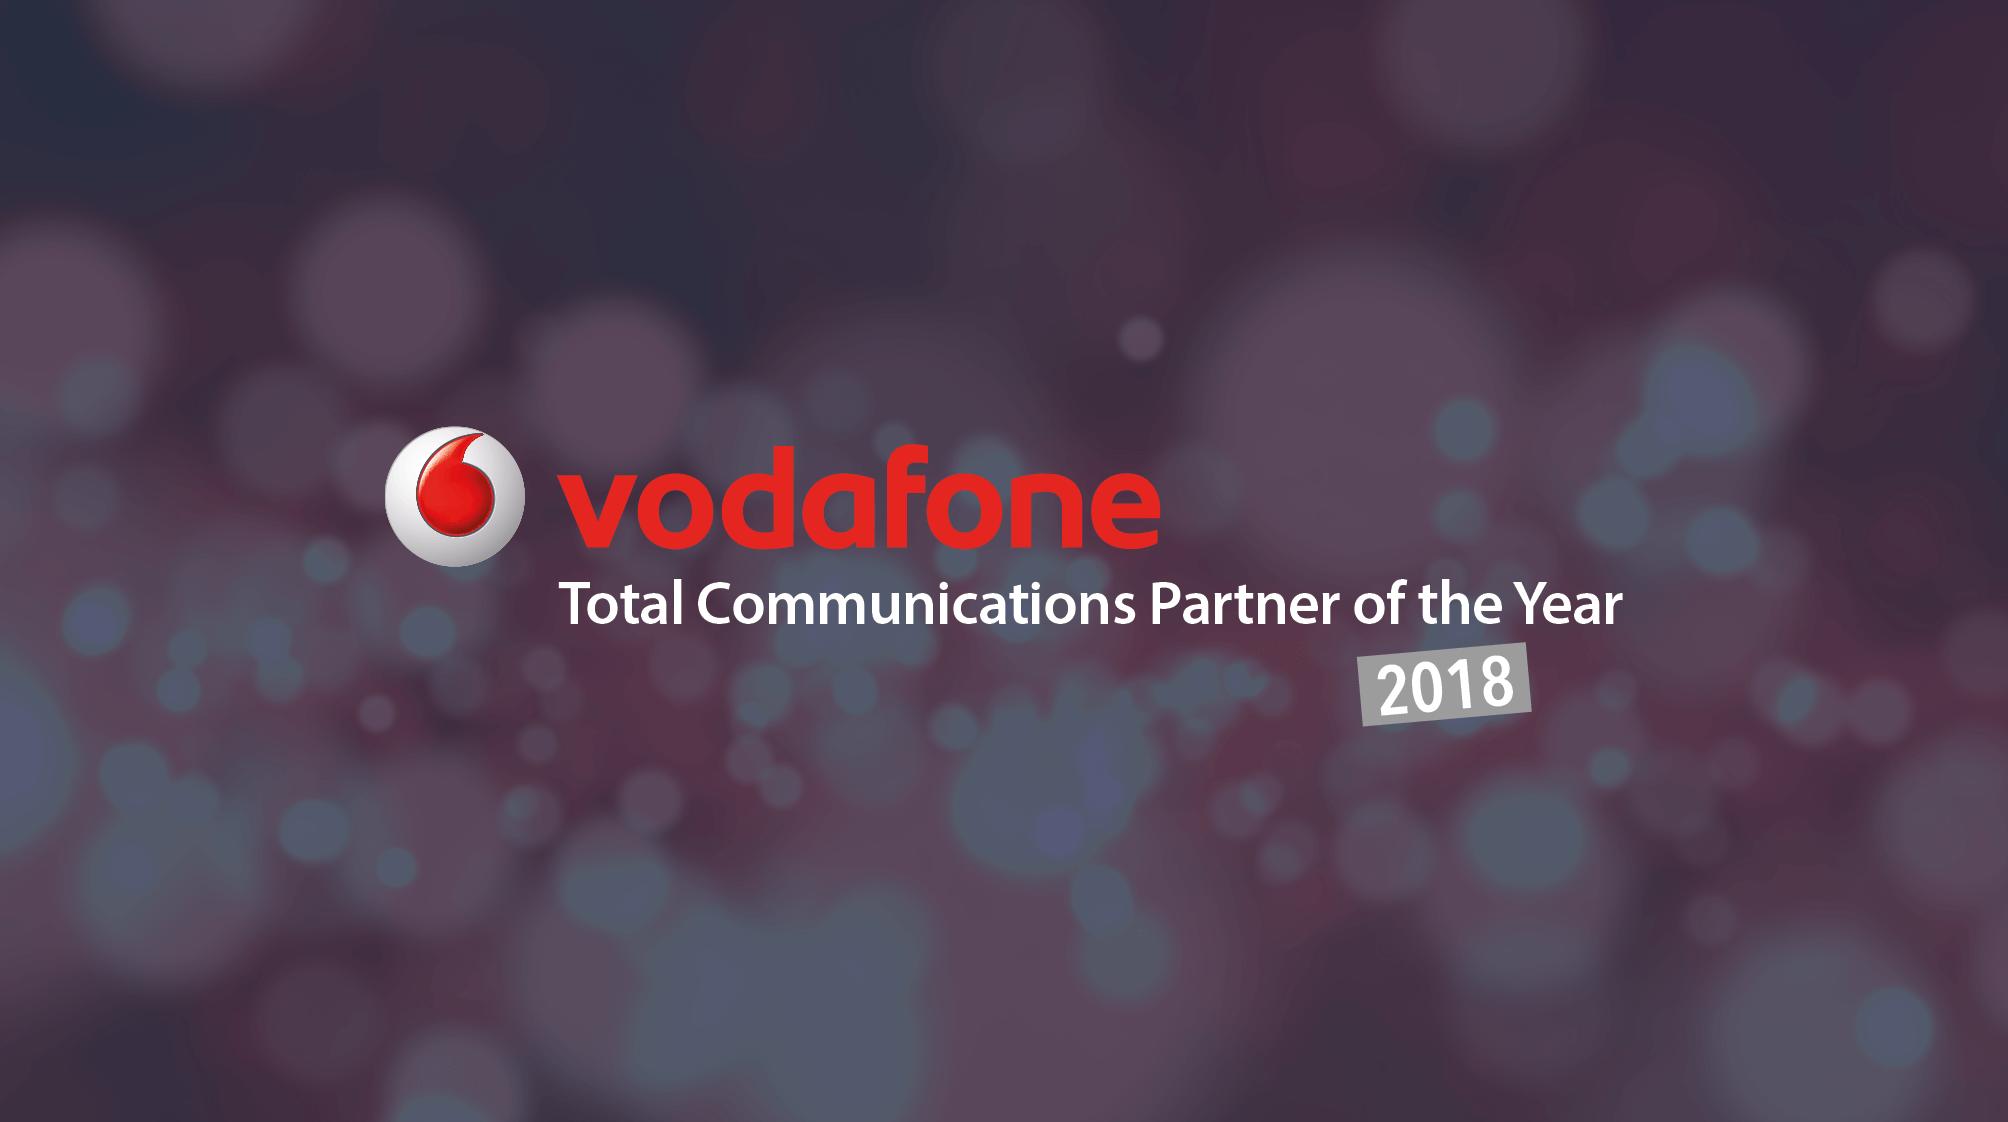 Onecom wins Total Communications Partner 2018 award at Vodafone Partner of the Year Awards 2018